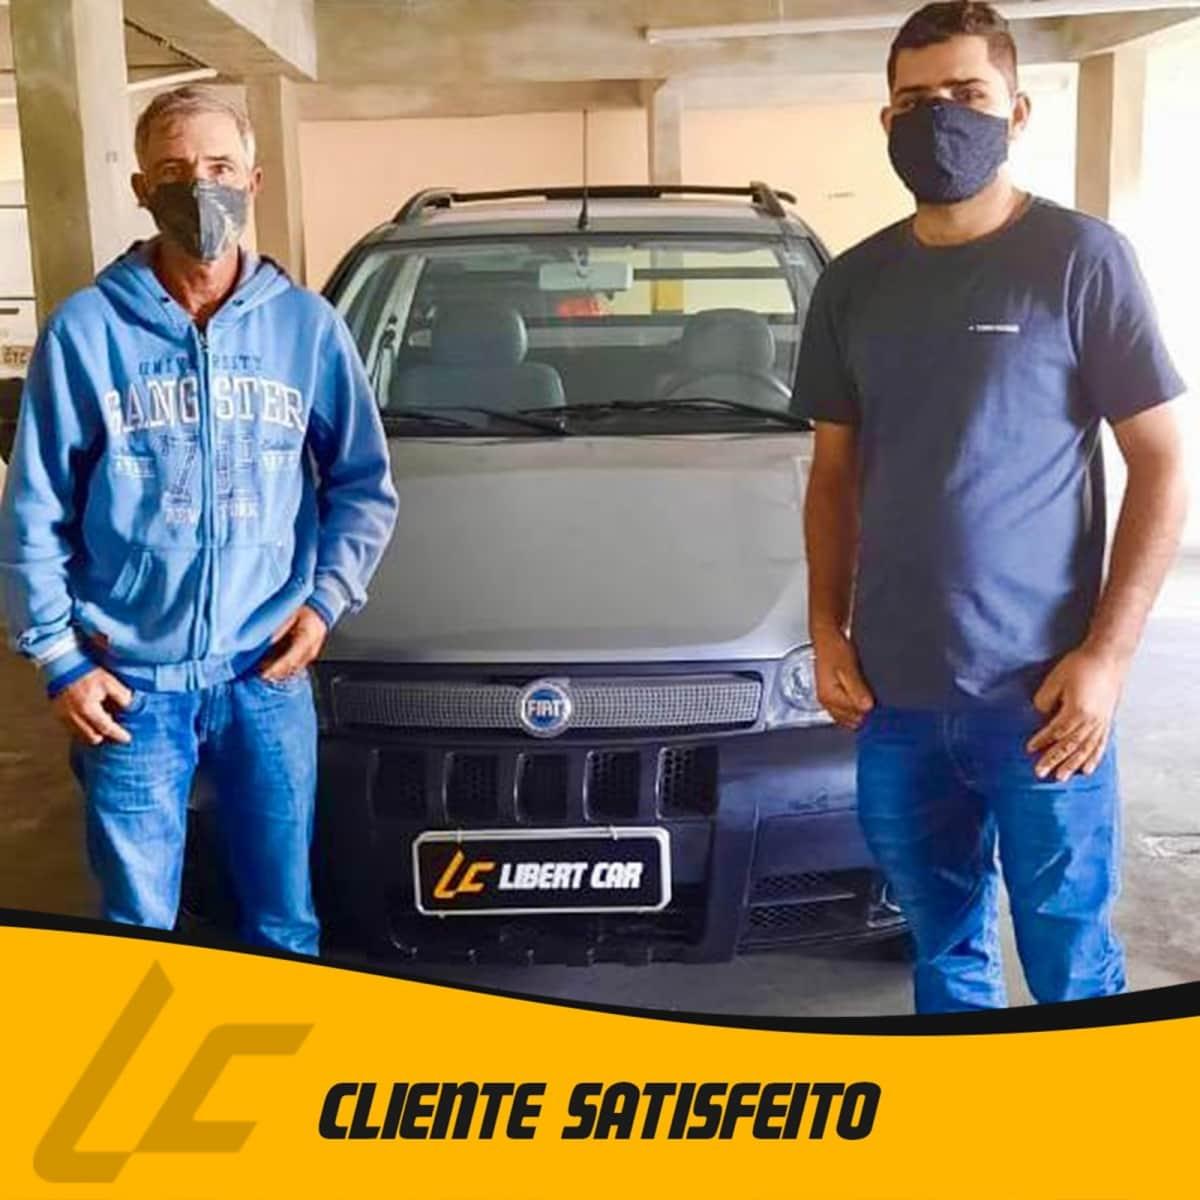 Cliente Satisfeito - Sr. Matozinho Luiz